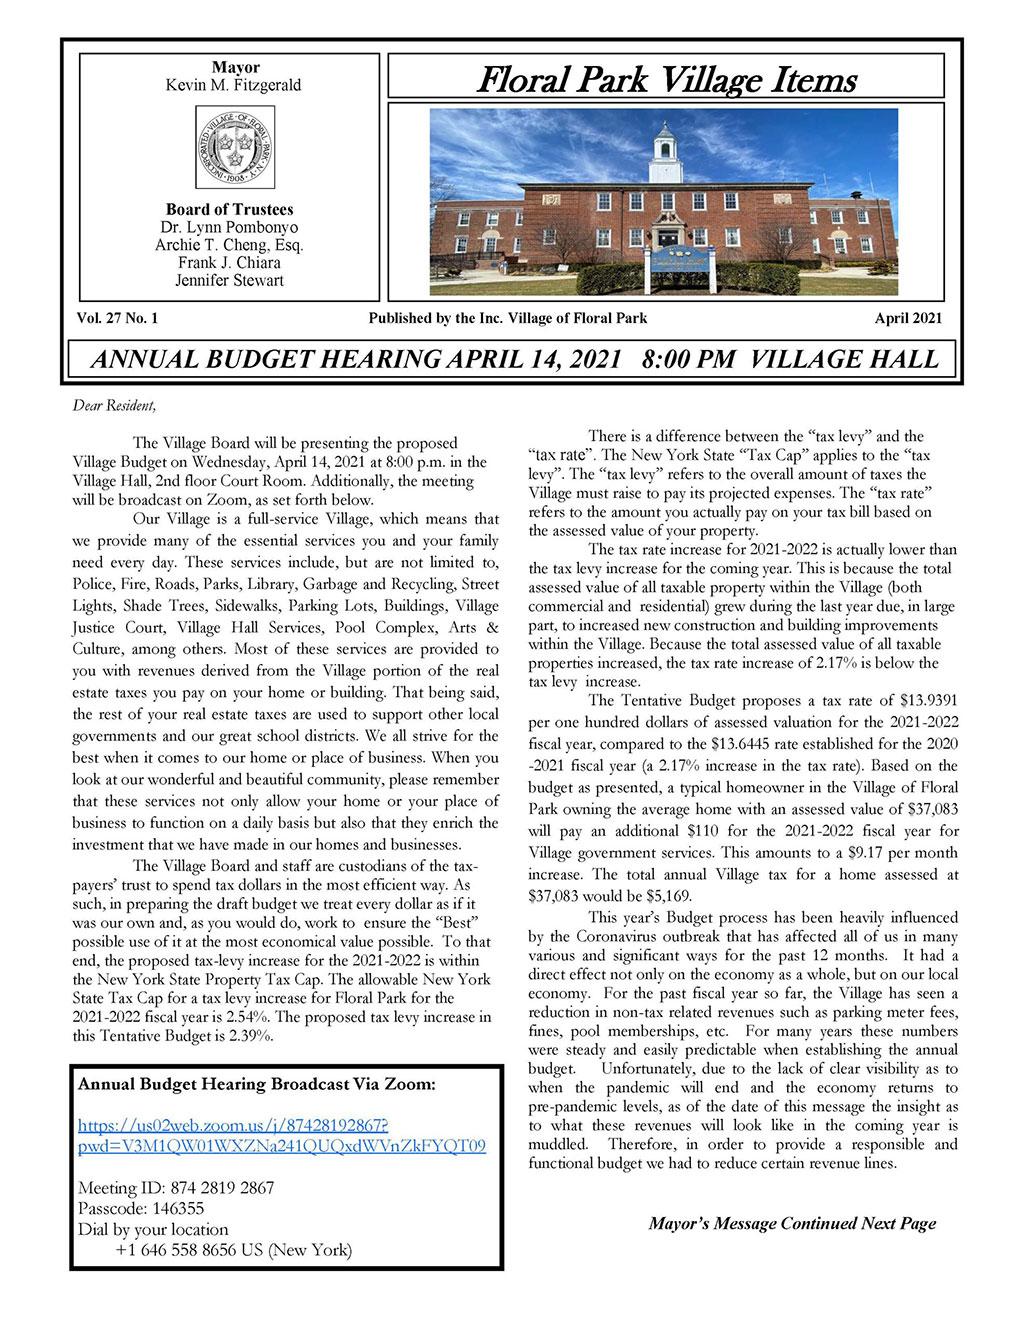 2021/2022 Tentative Budget & April Village Items